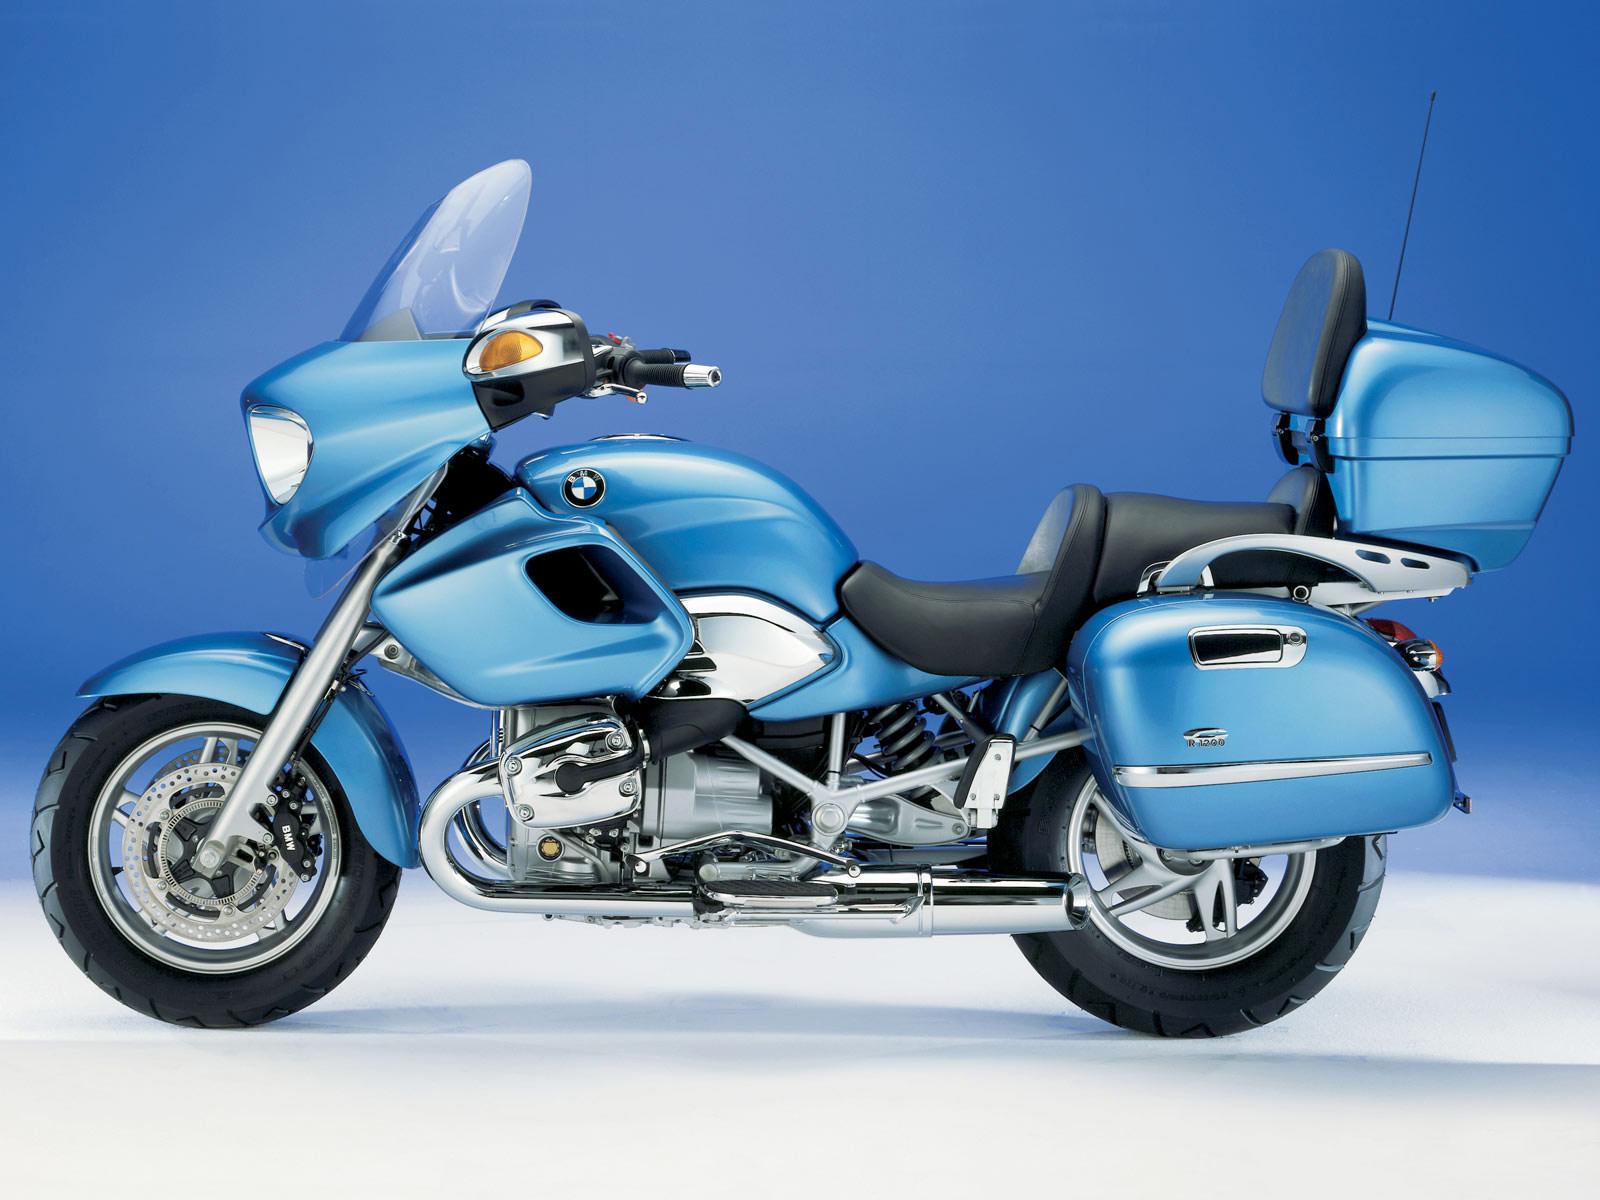 http://1.bp.blogspot.com/-9l6oc3N0UME/Th7woS-BTGI/AAAAAAAAAJQ/en0-adCb-BU/s1600/BMW_R1200CL_2002_5.jpg